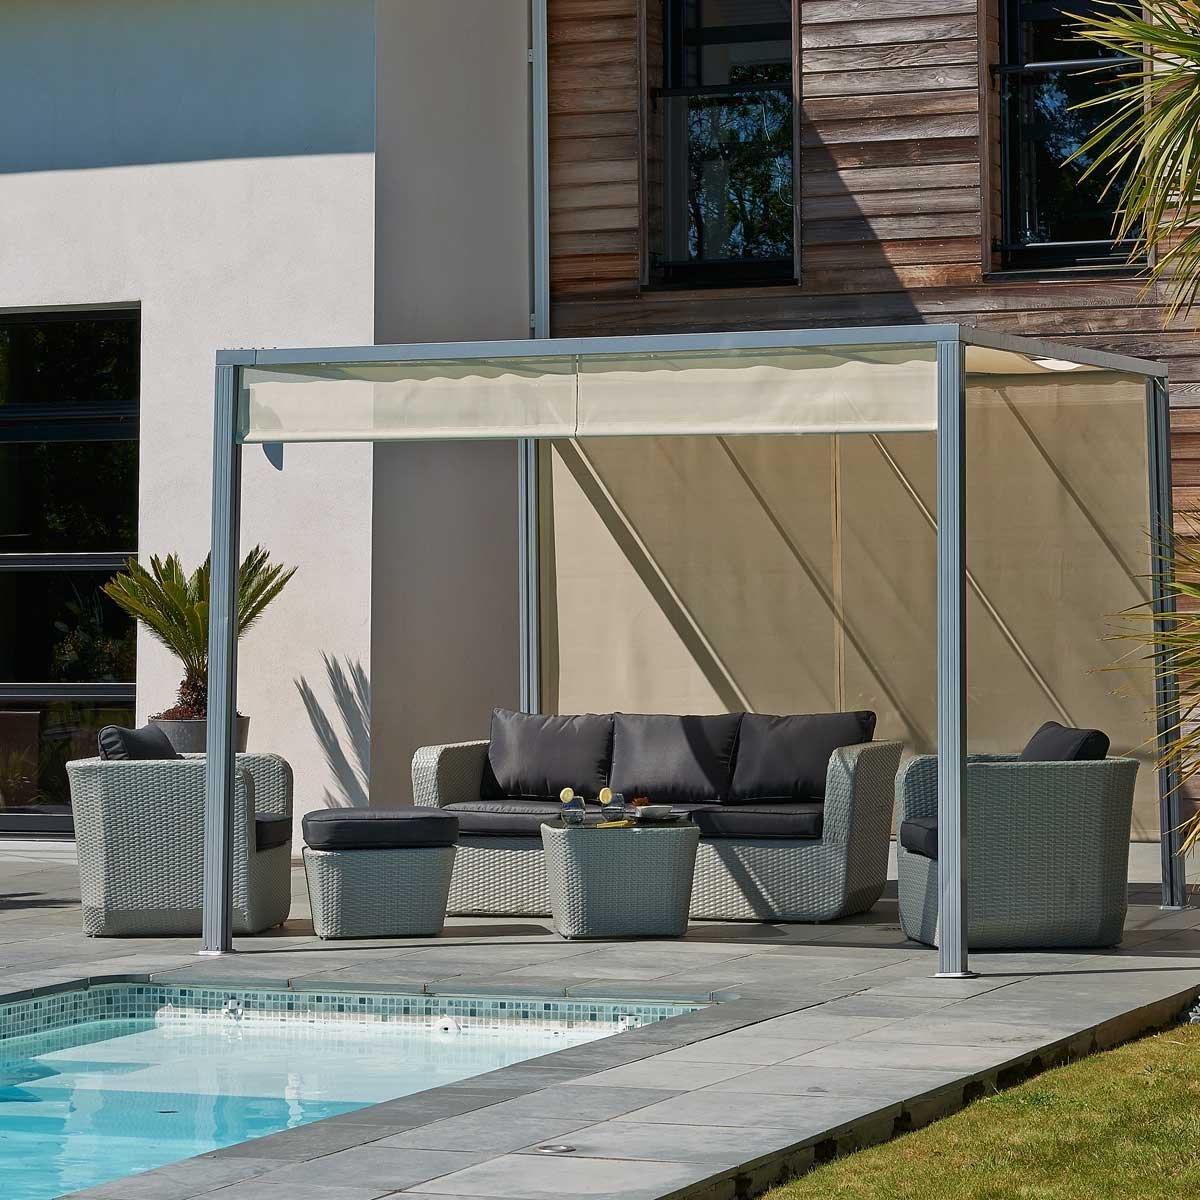 tonnelle alu 3x3 excellent tonnelle de jardin aluminium brico depot abri de jardin metal au gr. Black Bedroom Furniture Sets. Home Design Ideas